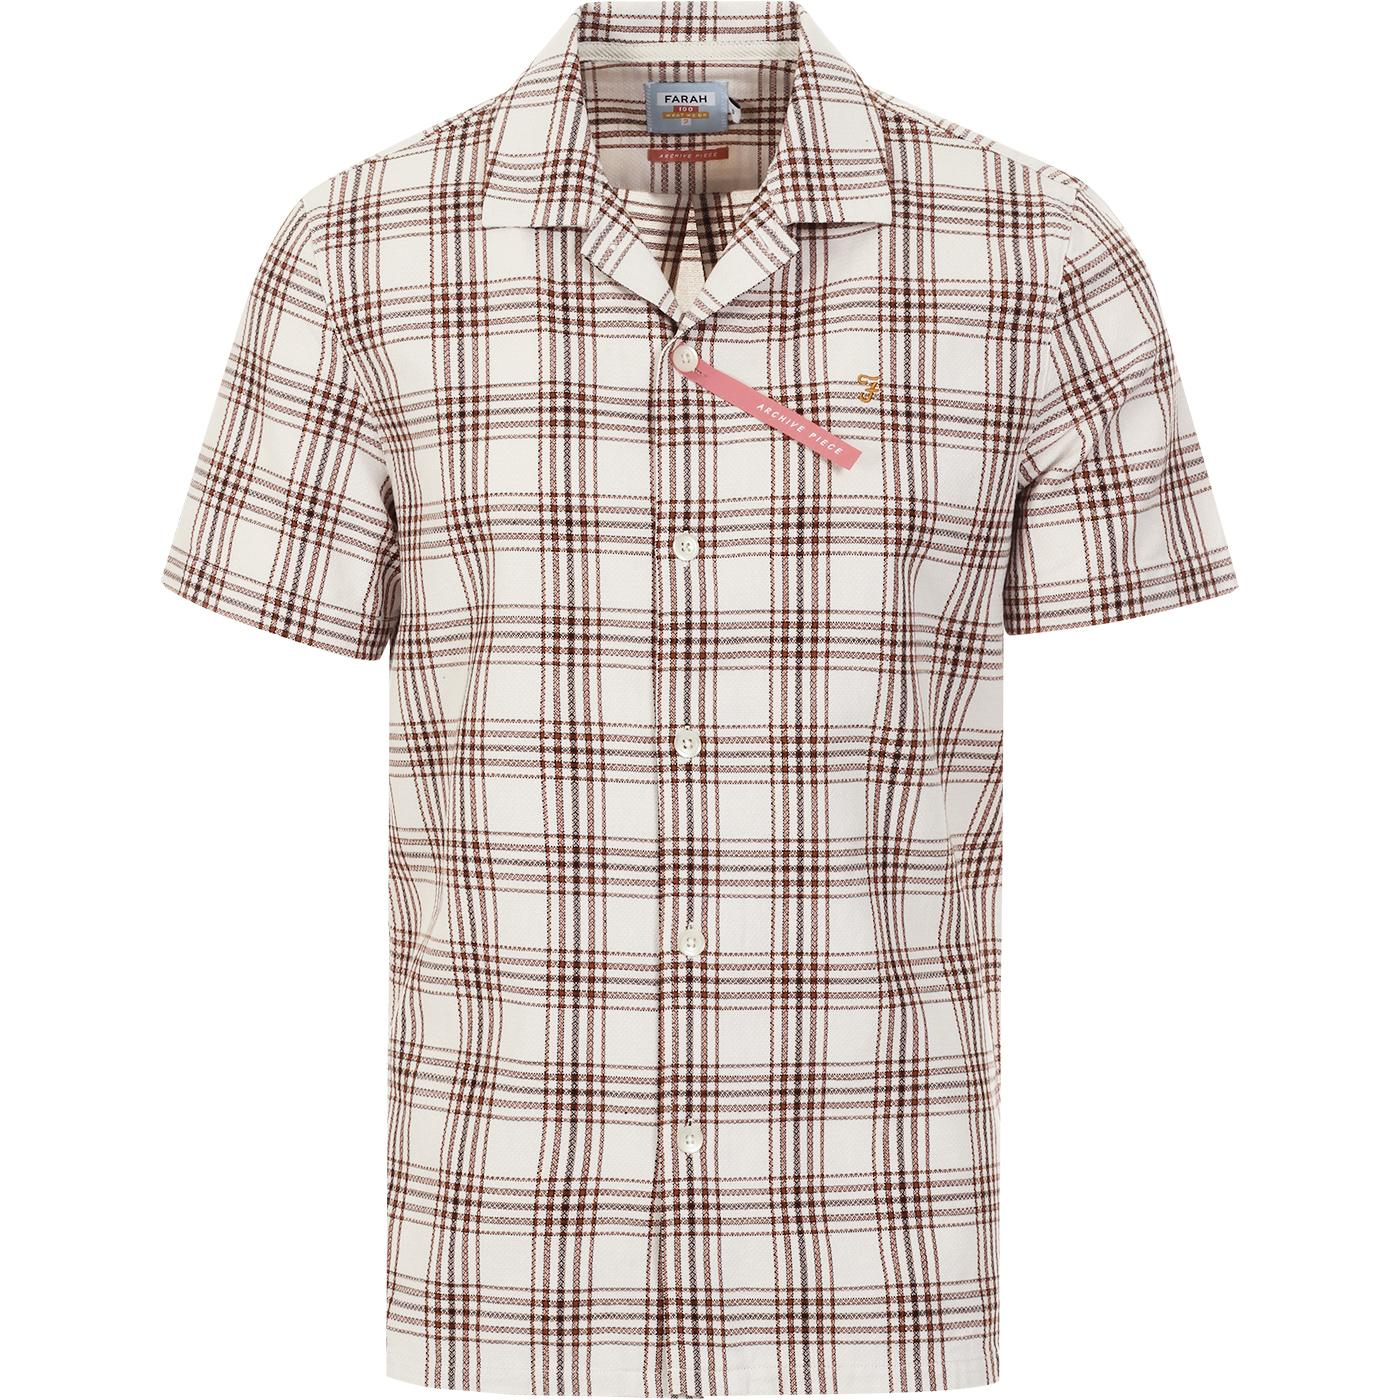 Crockett FARAH Archive Check Seersucker Shirt (R)